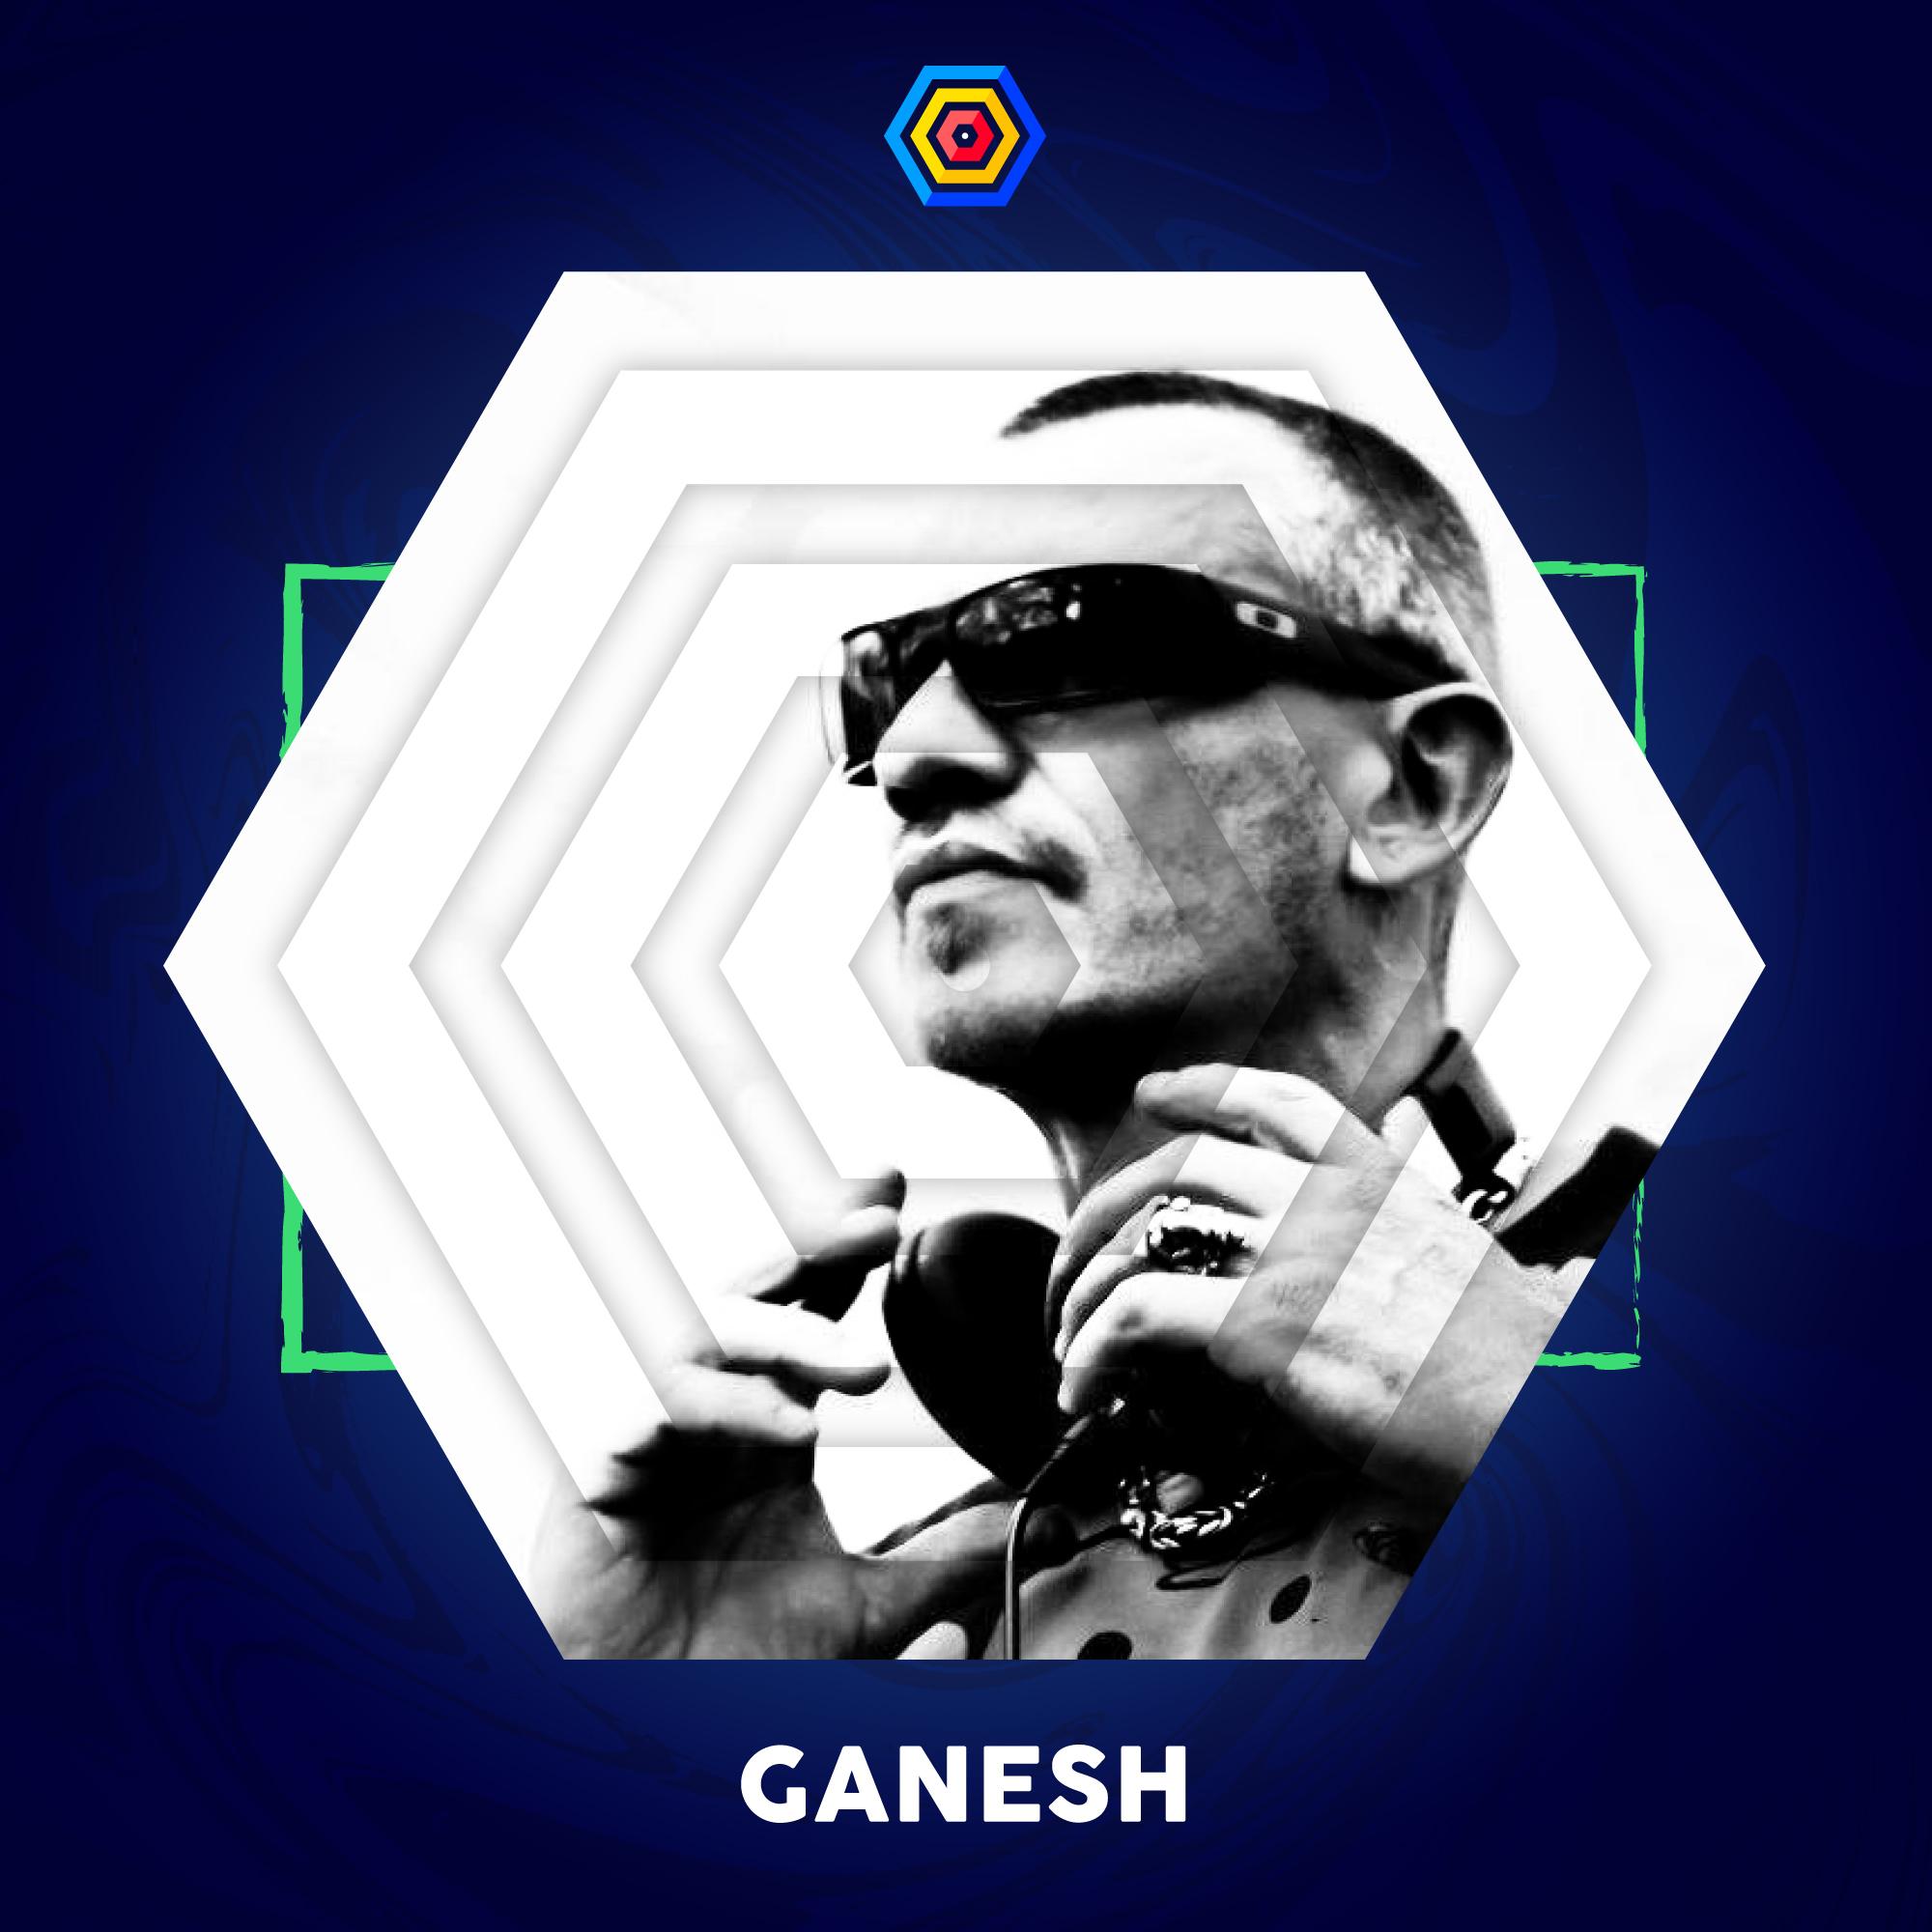 Ganesh